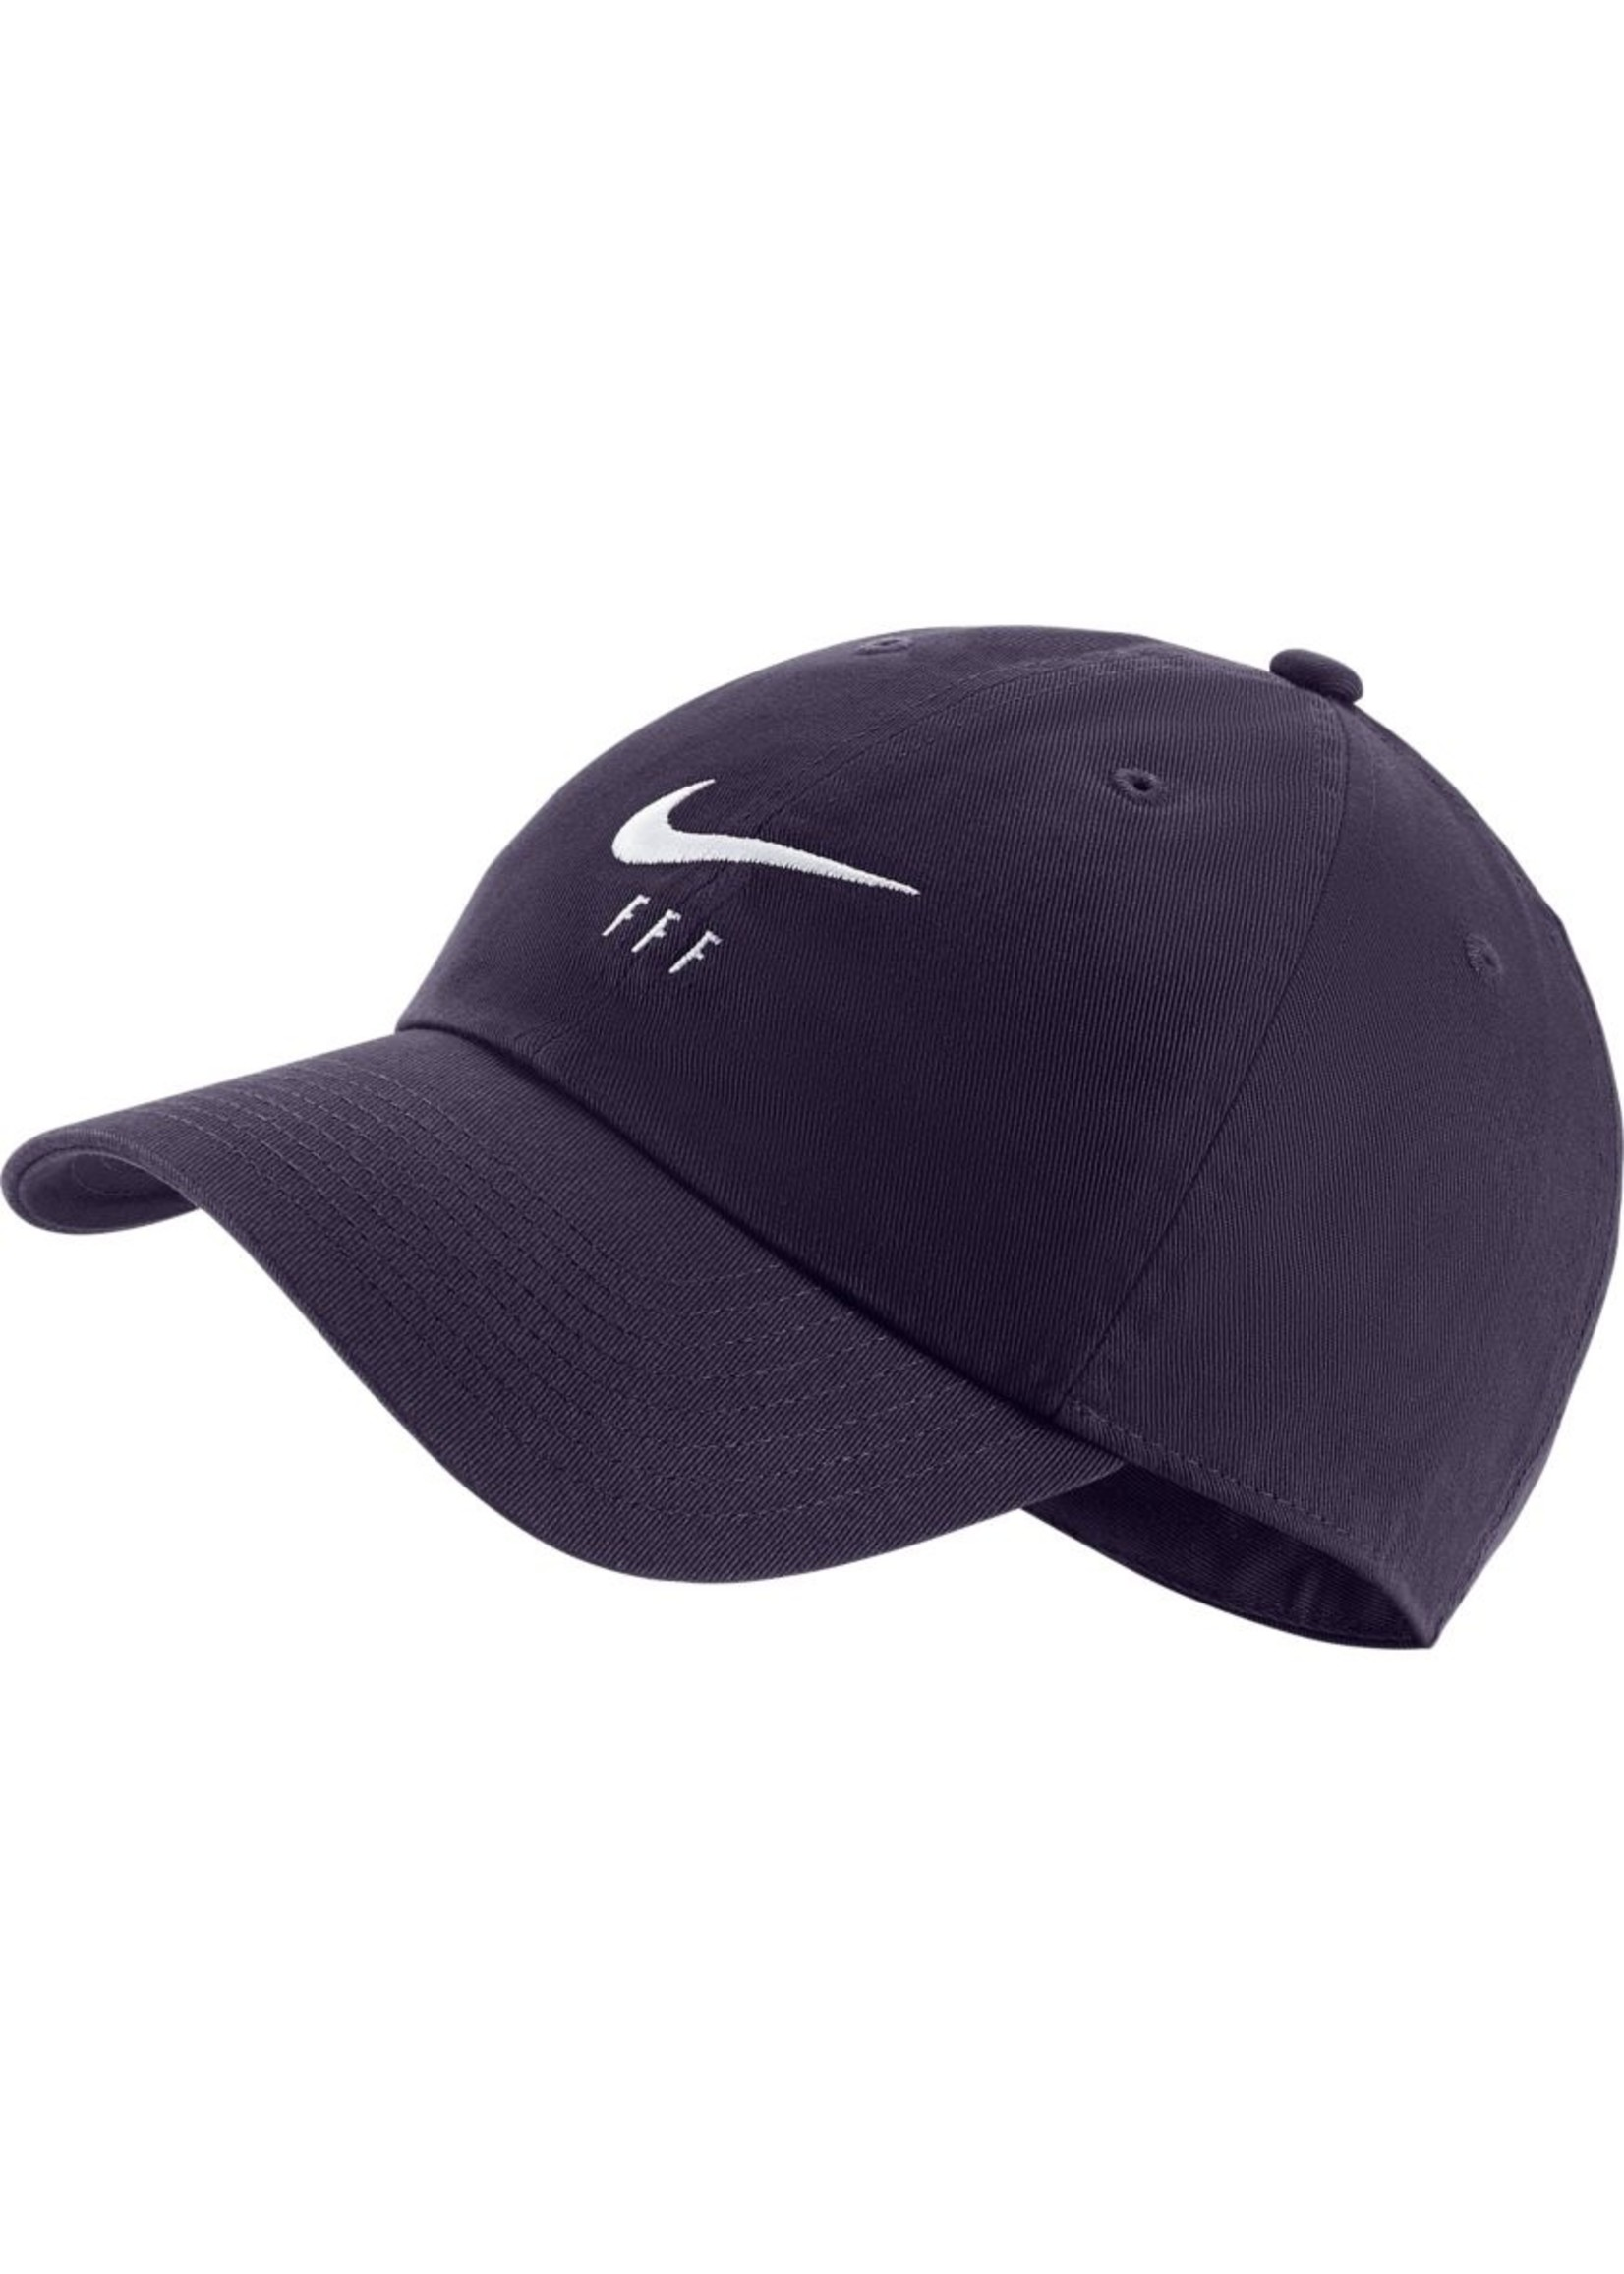 Nike France Cap - Navy